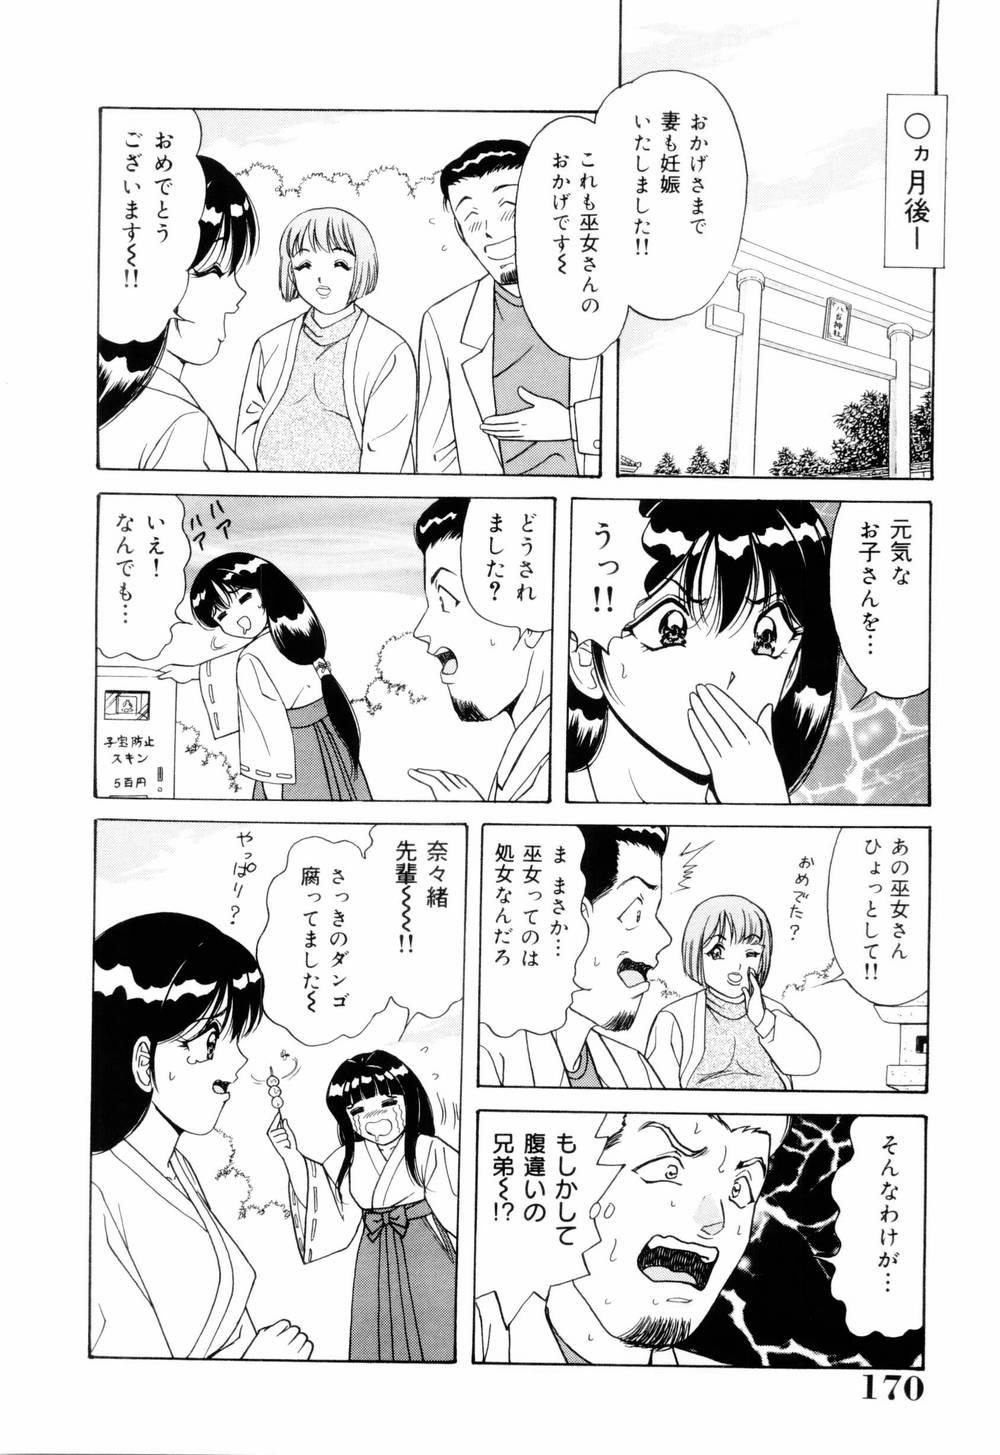 SuiCup Joshi Announcer Jikkyo Chukei Rape 173